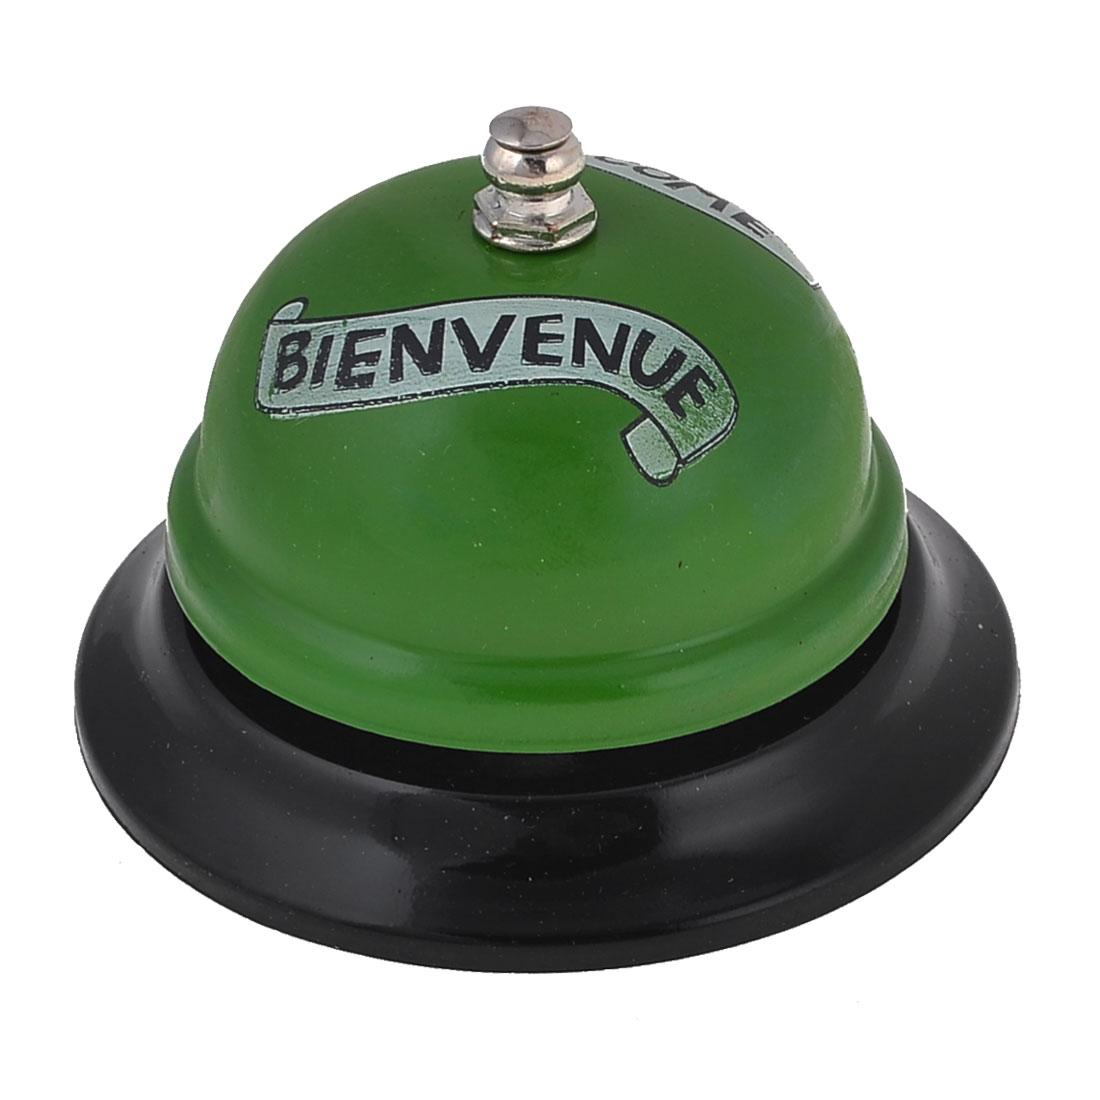 "Green Black Metal Words Prints Table Call Bell Ring 3.3"" Base Diameter"